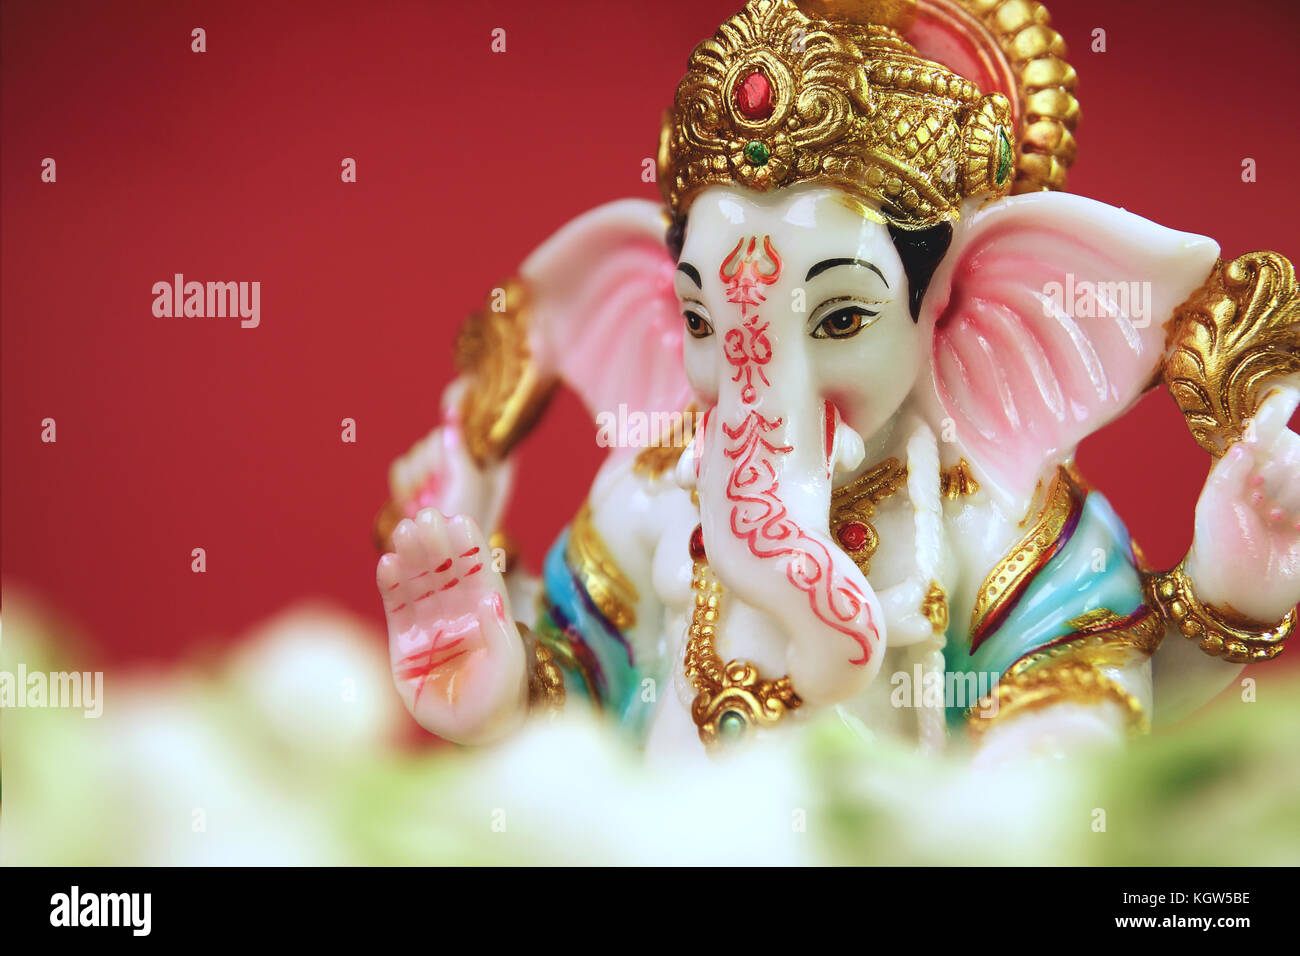 Vinayak Stock Photos & Vinayak Stock Images - Page 3 - Alamy